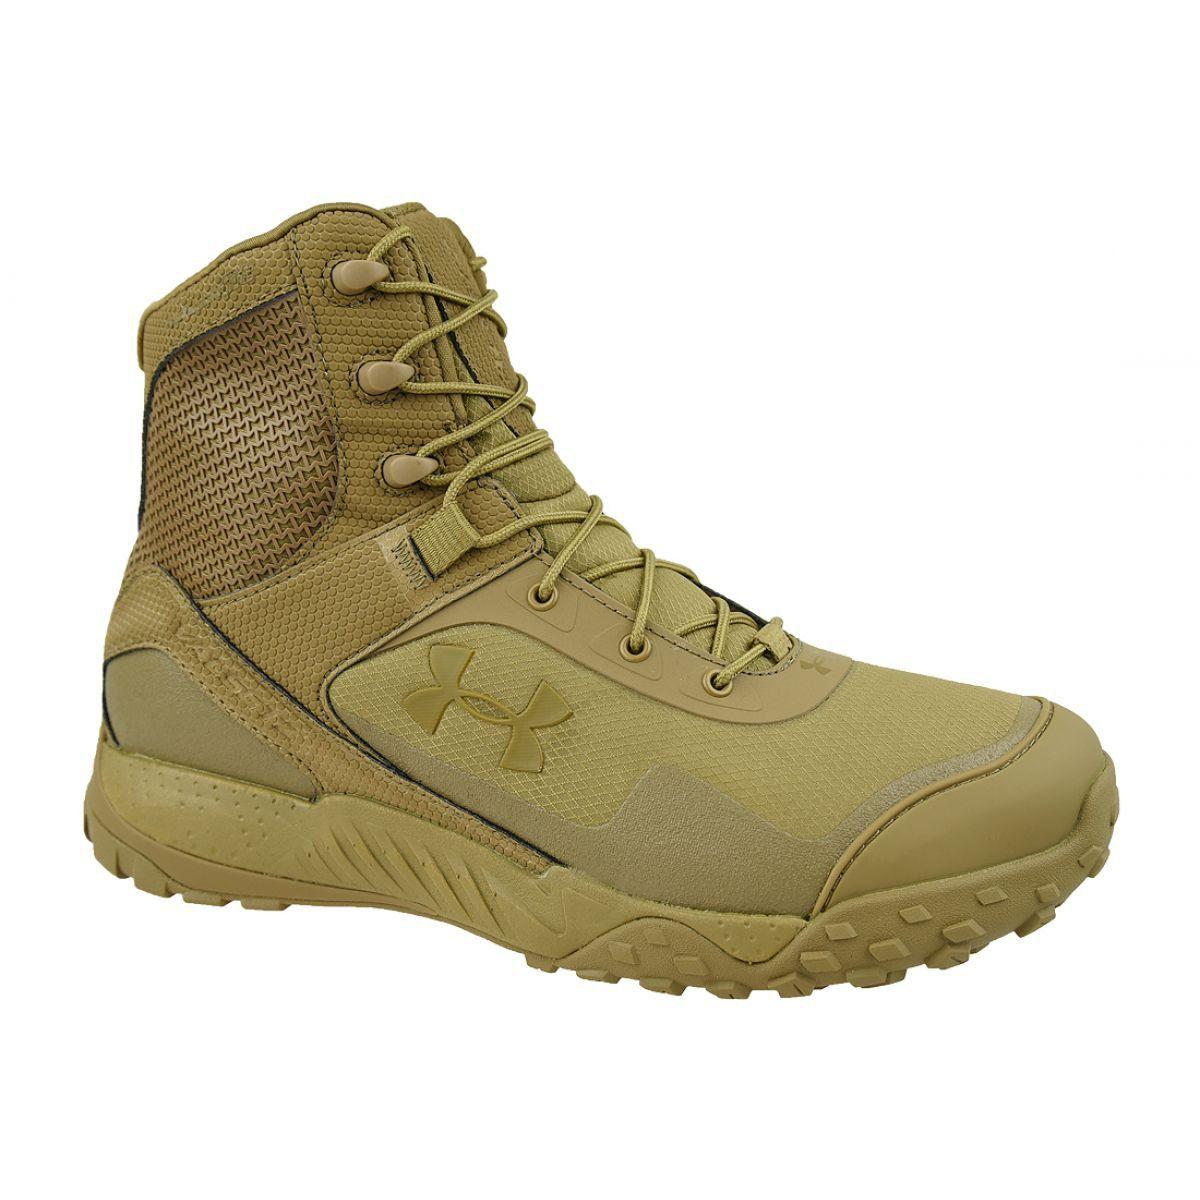 Buty Under Armour Valsetz Rts 1 5 M 3021034 200 Brazowe Under Armour Under Armor Boots